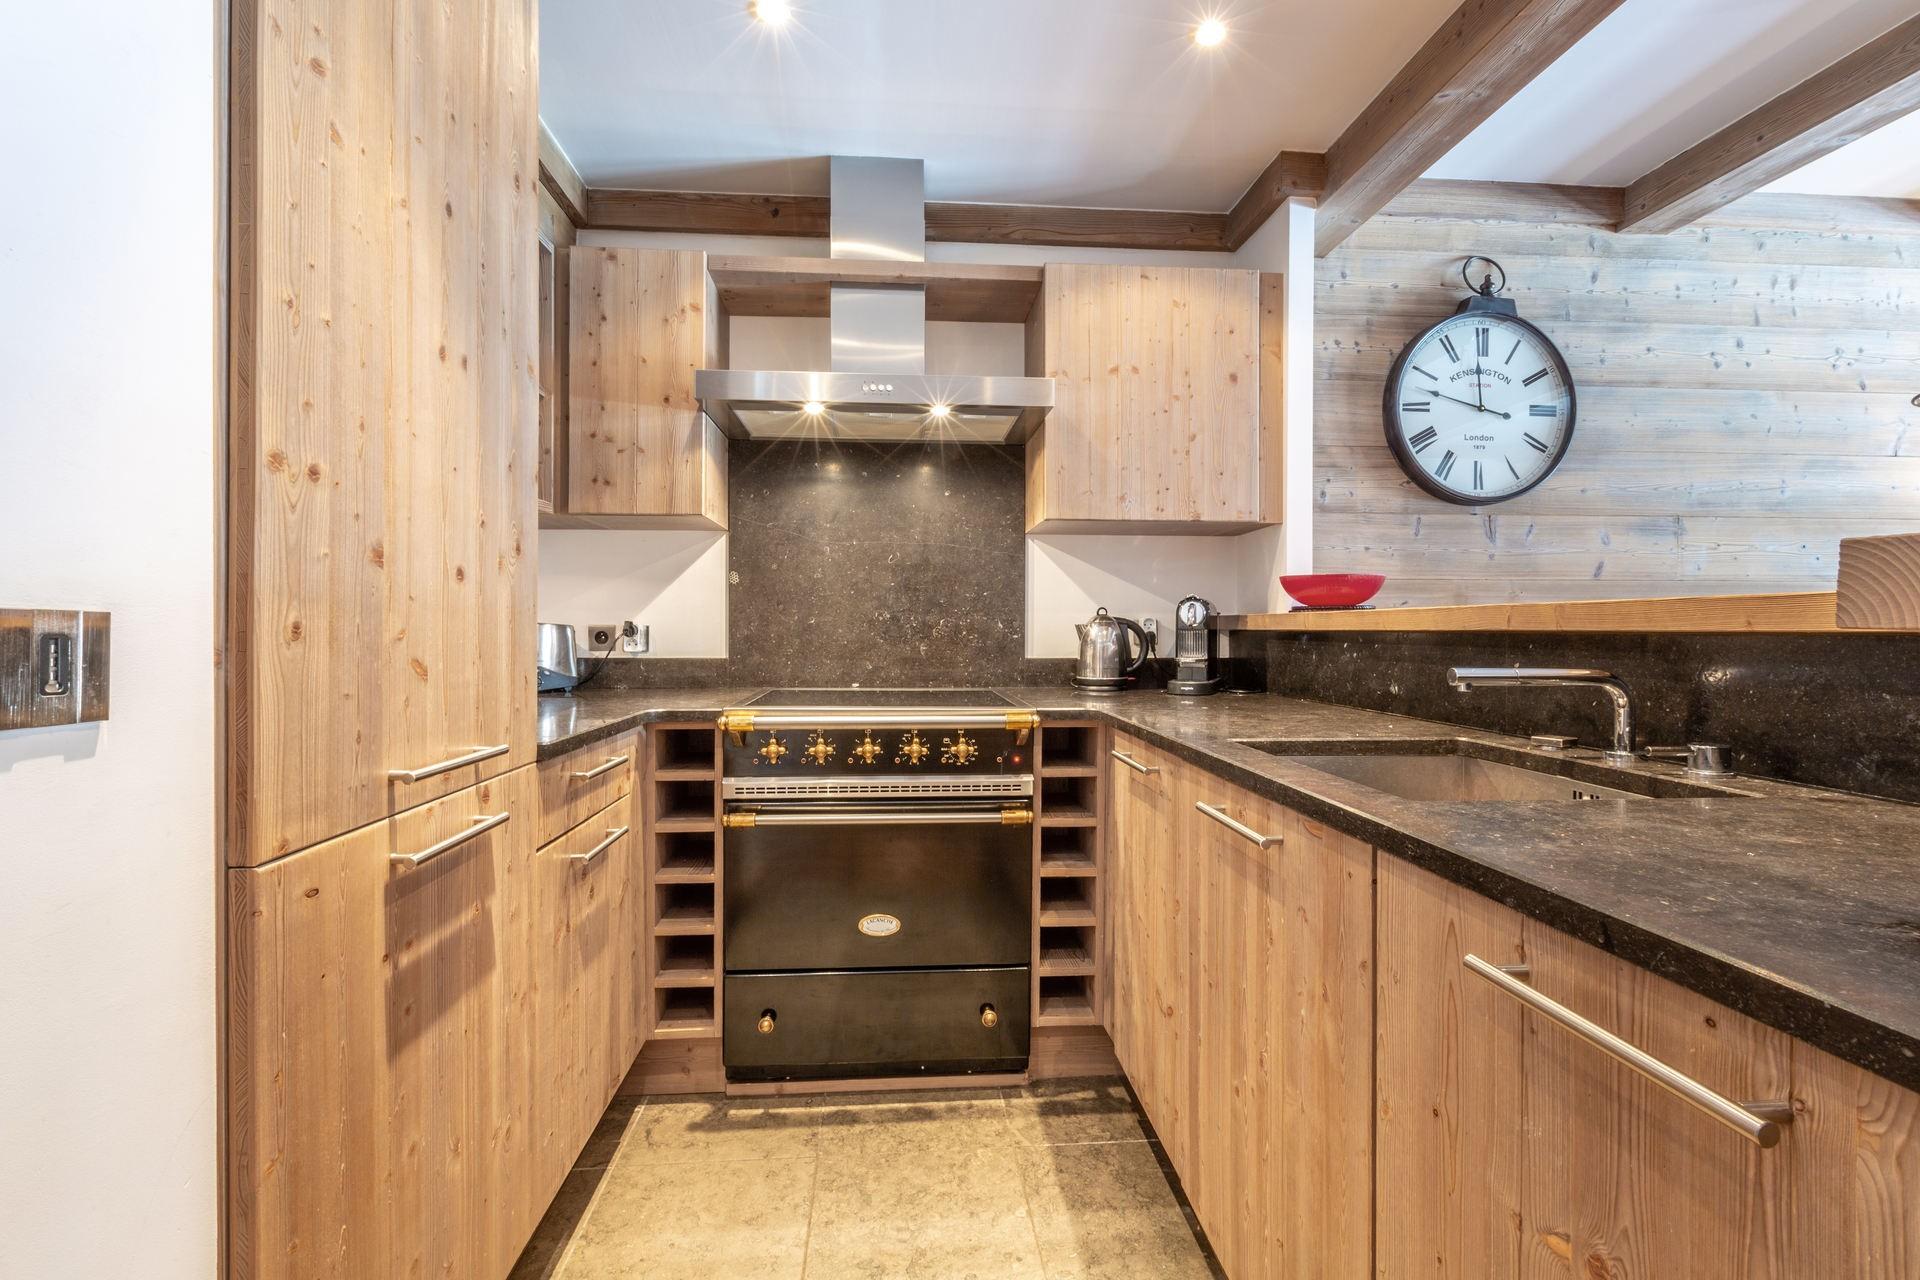 Val d'Isère Luxury Rental Apartment Vaulite Kitchen 3